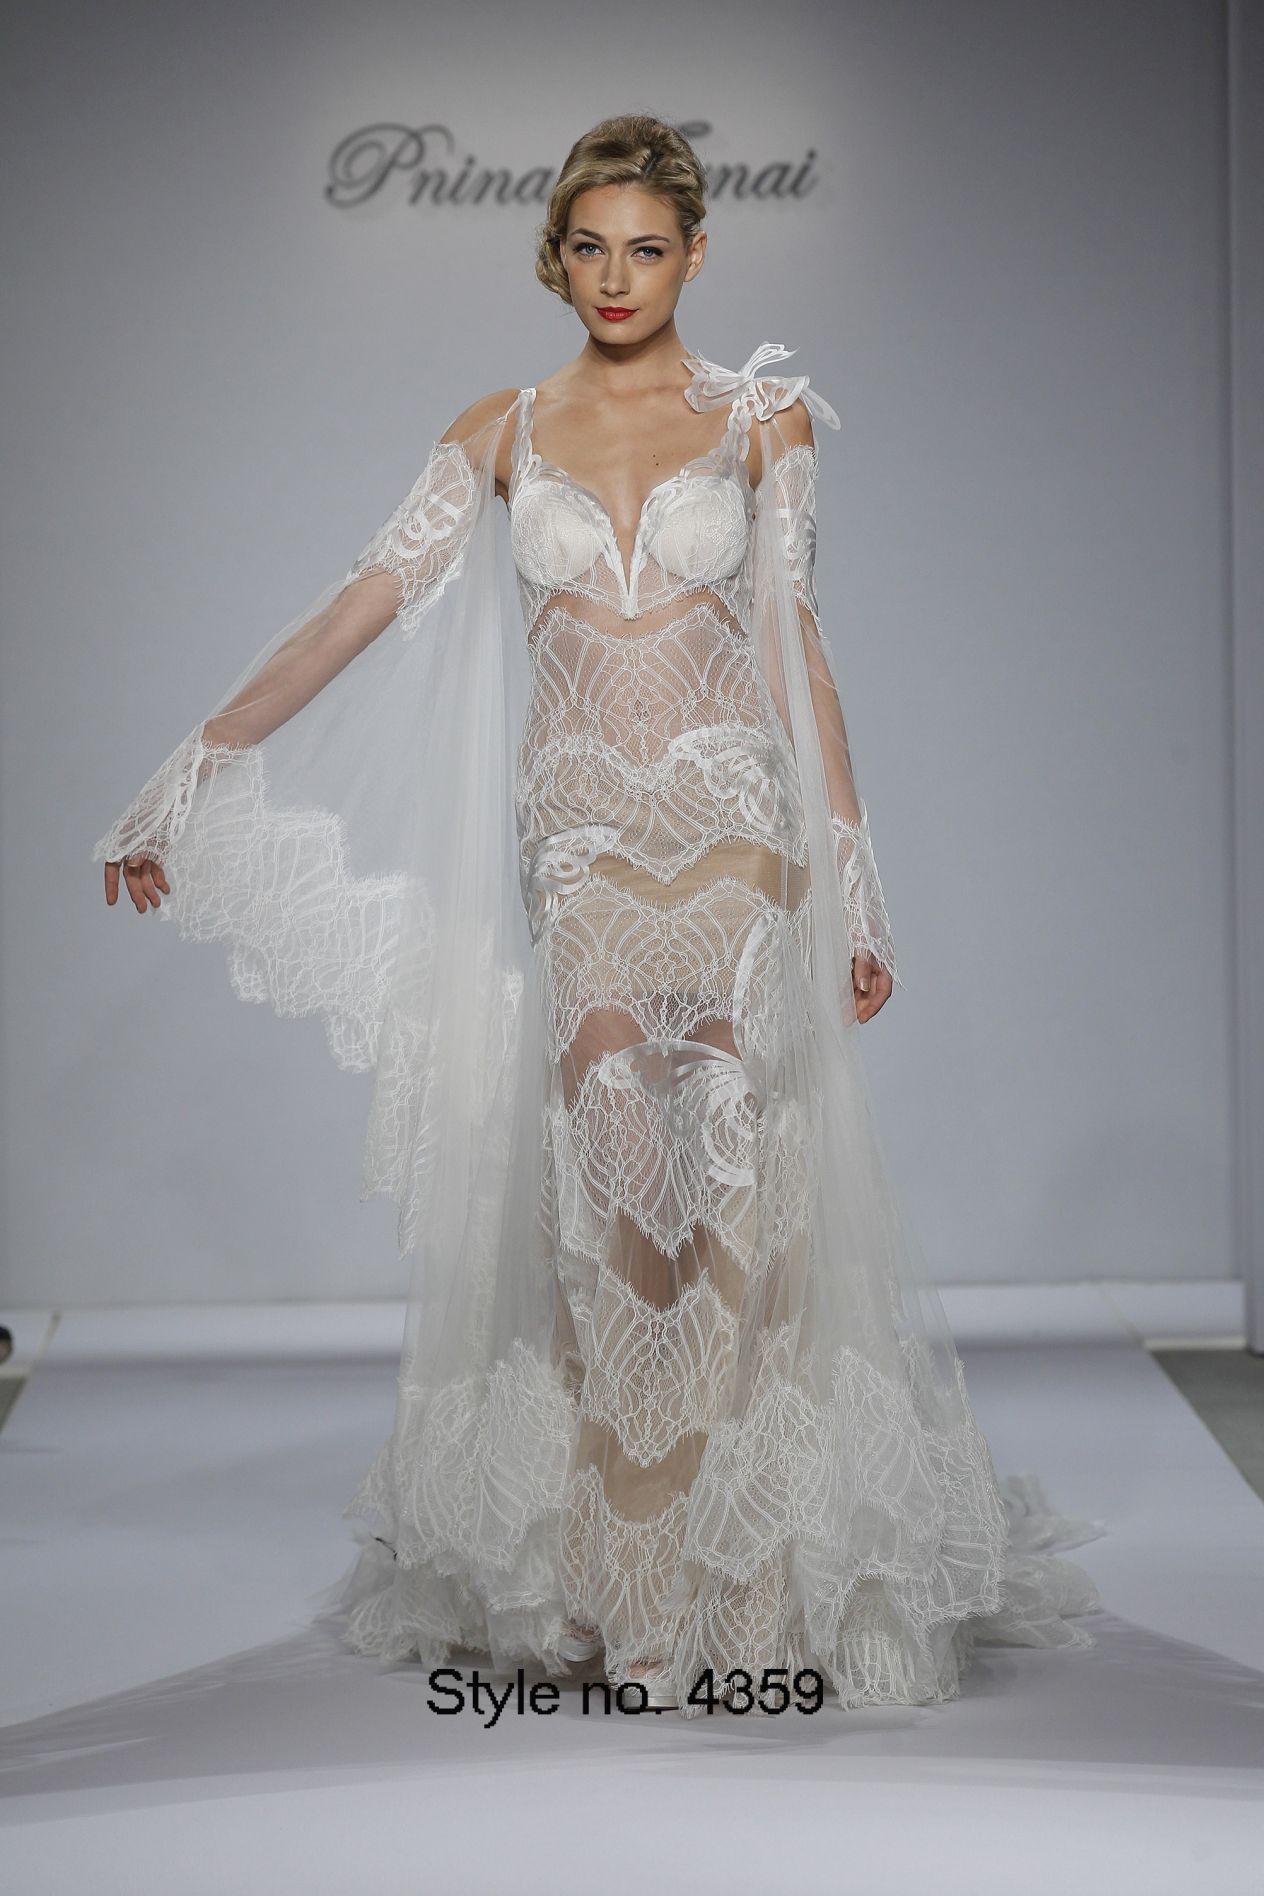 Pnina Tornai 2015 Mermaid See Through Wedding Dresses Lace